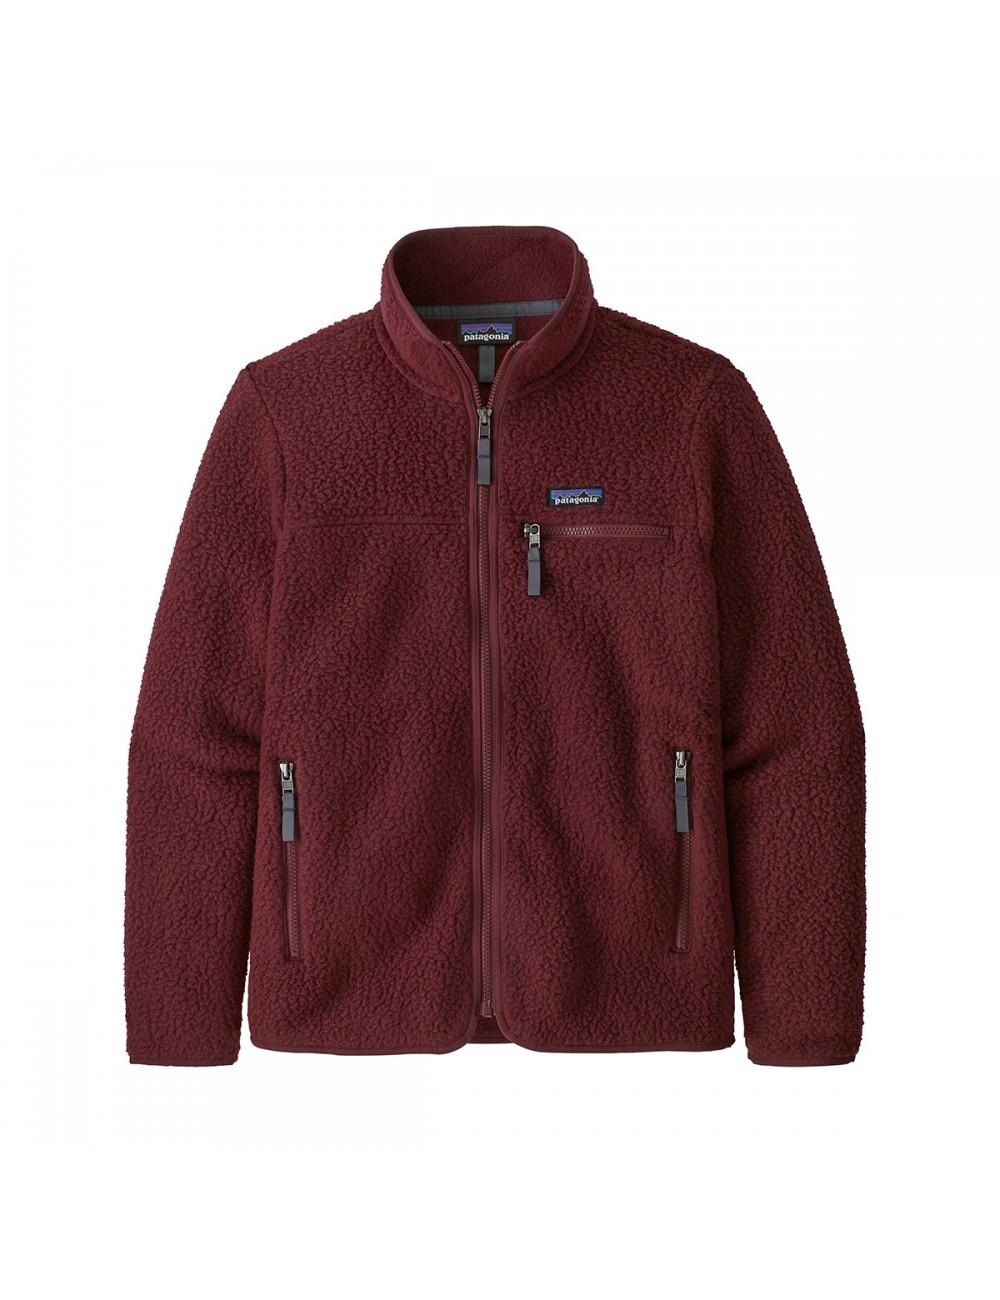 Patagonia Retro Pile Jacket - Chicory Red_13294